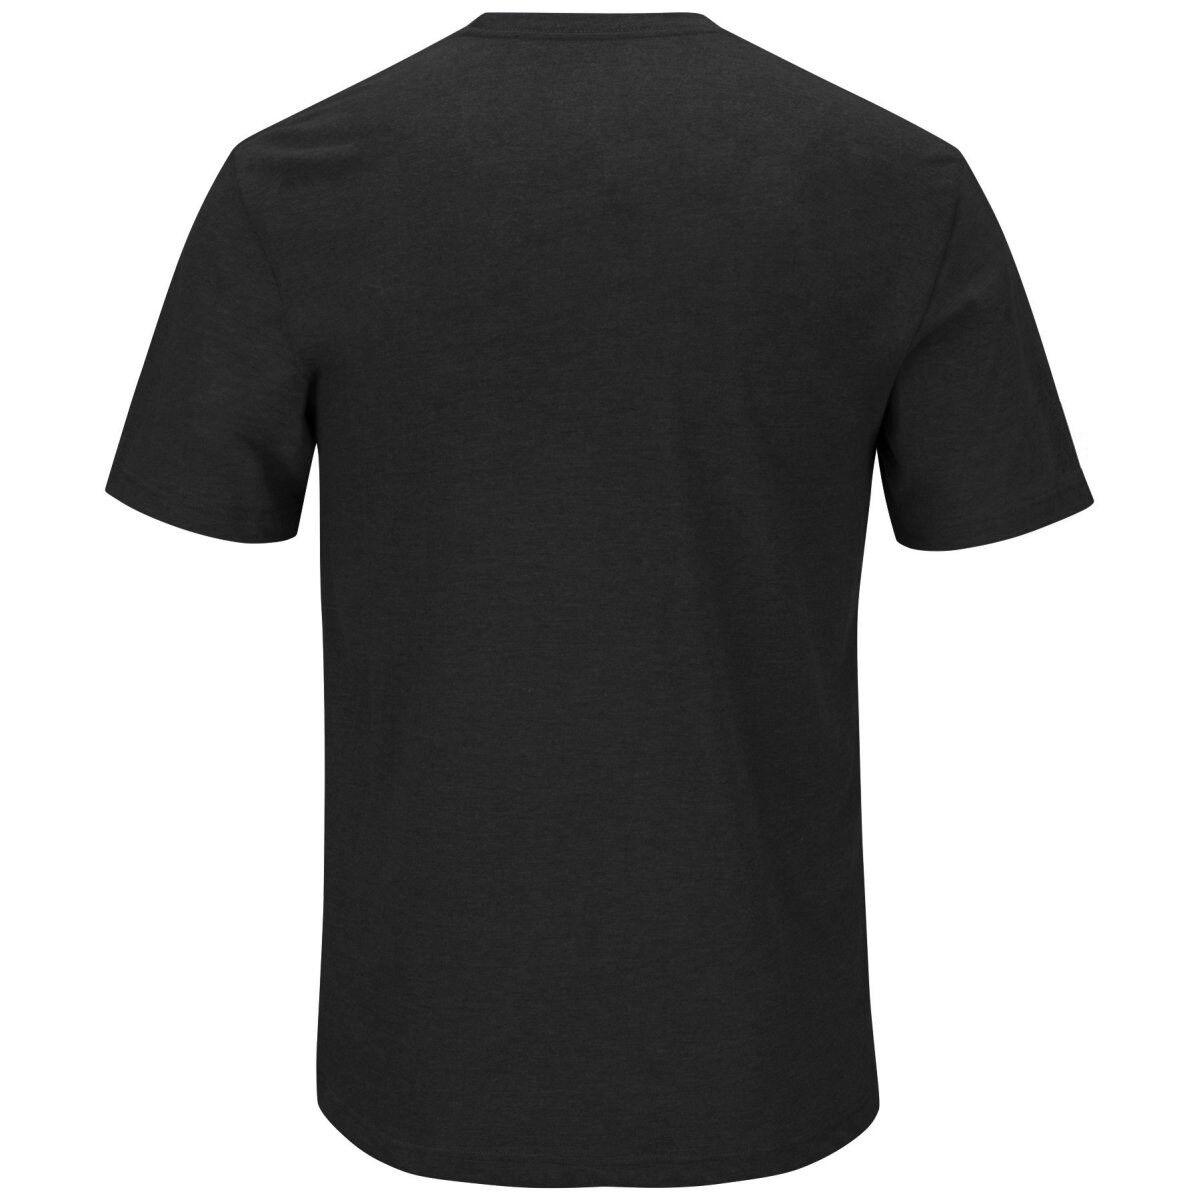 NFL FOOTBALL Philadelphia Philadelphia Philadelphia Eagles T-shirt tè Greatness Nero c19292